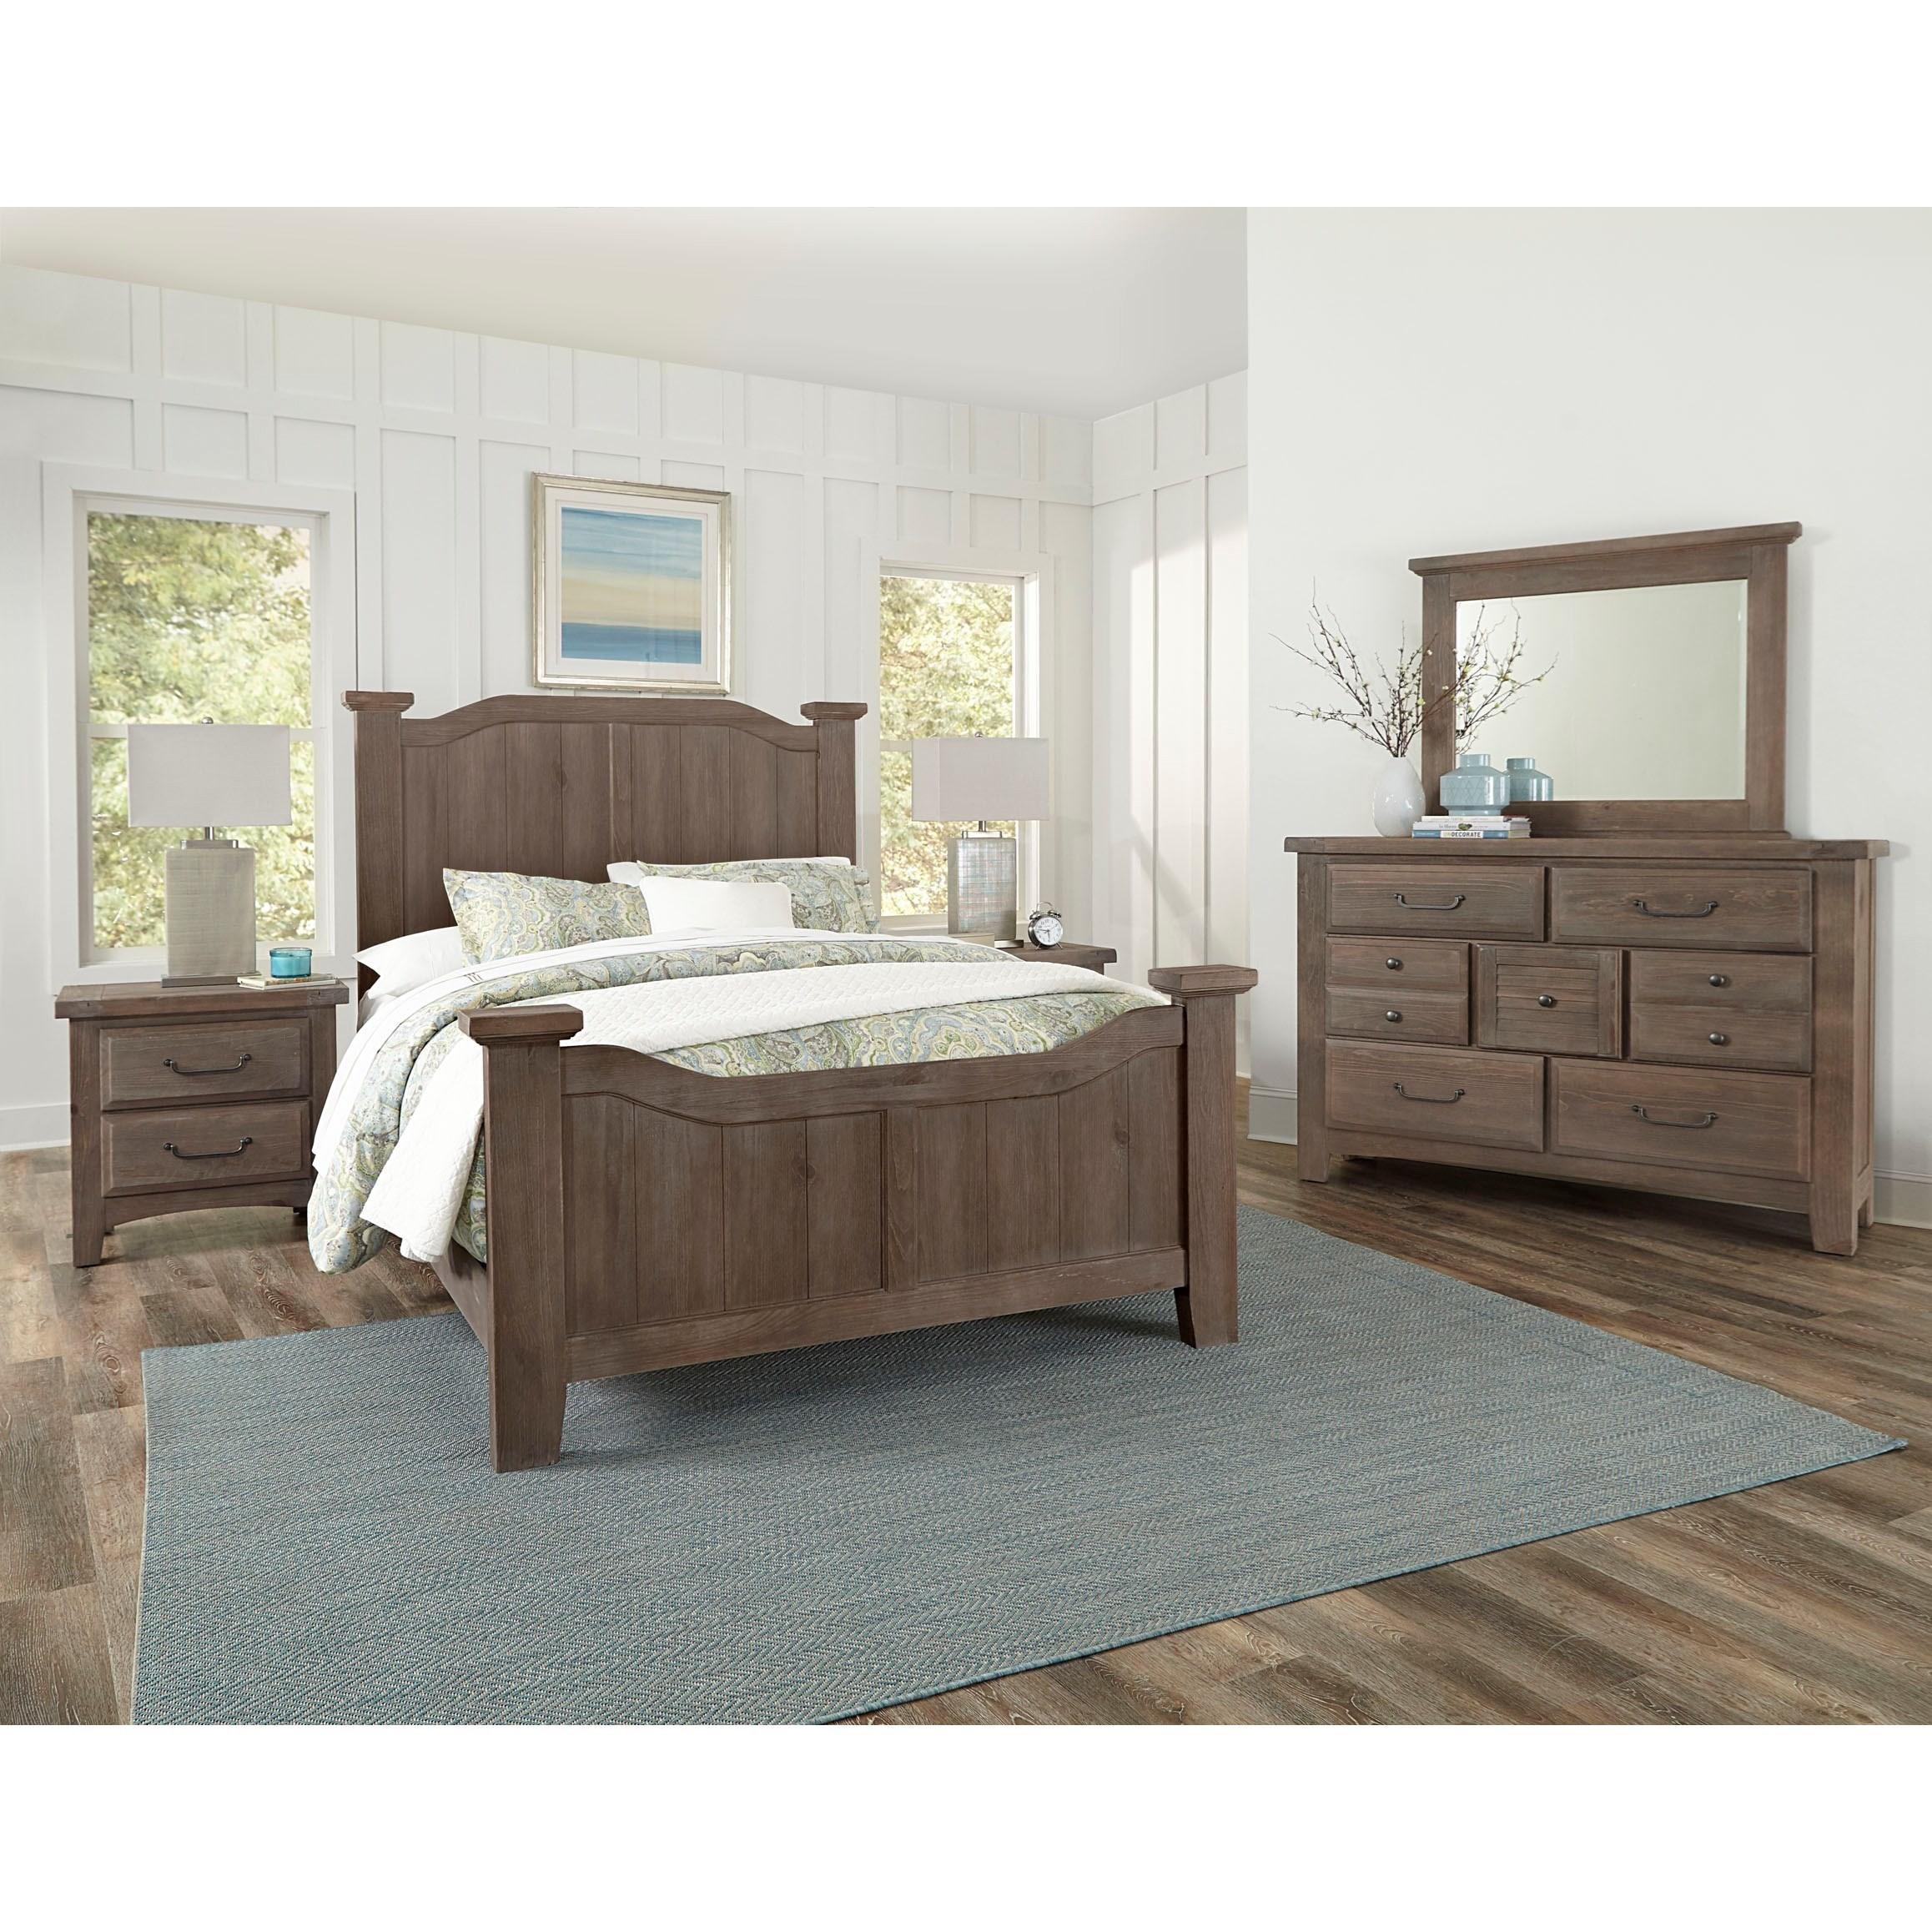 Vaughan Bassett Bedroom Set: Vaughan Bassett Sawmill King Bedroom Group